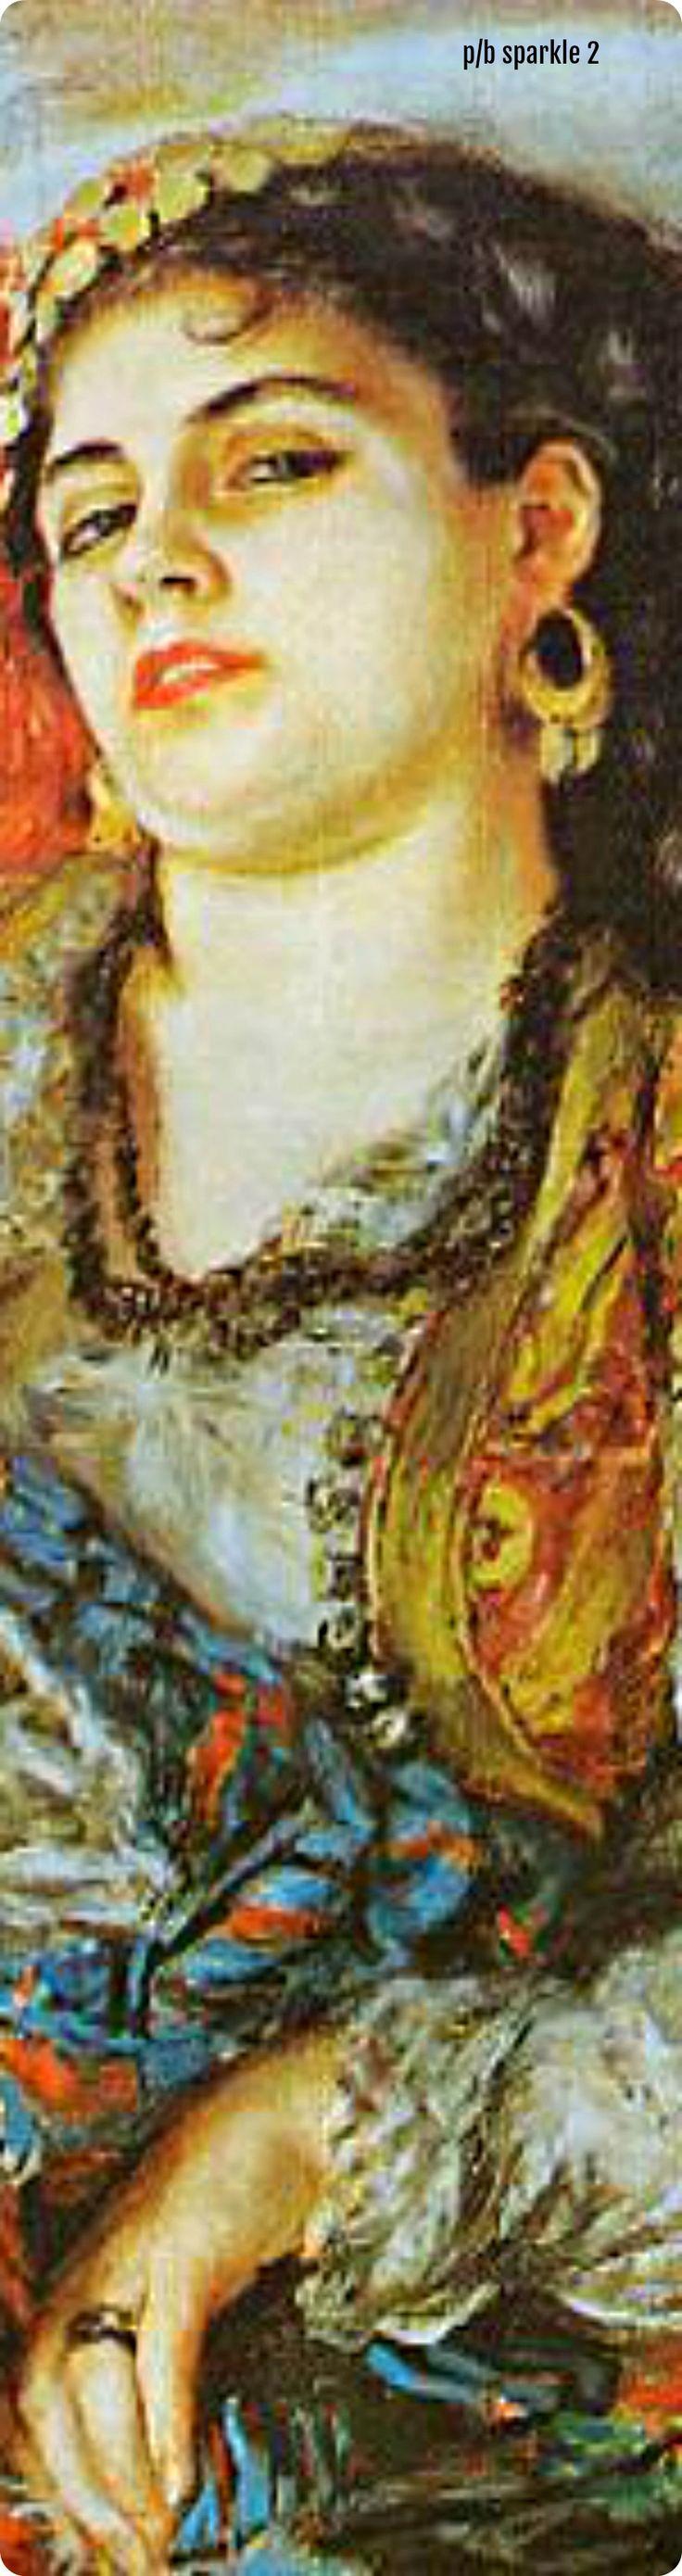 Pierre-Auguste Renoir (1841-1919): Odalisque (An Algerian Woman), 1870